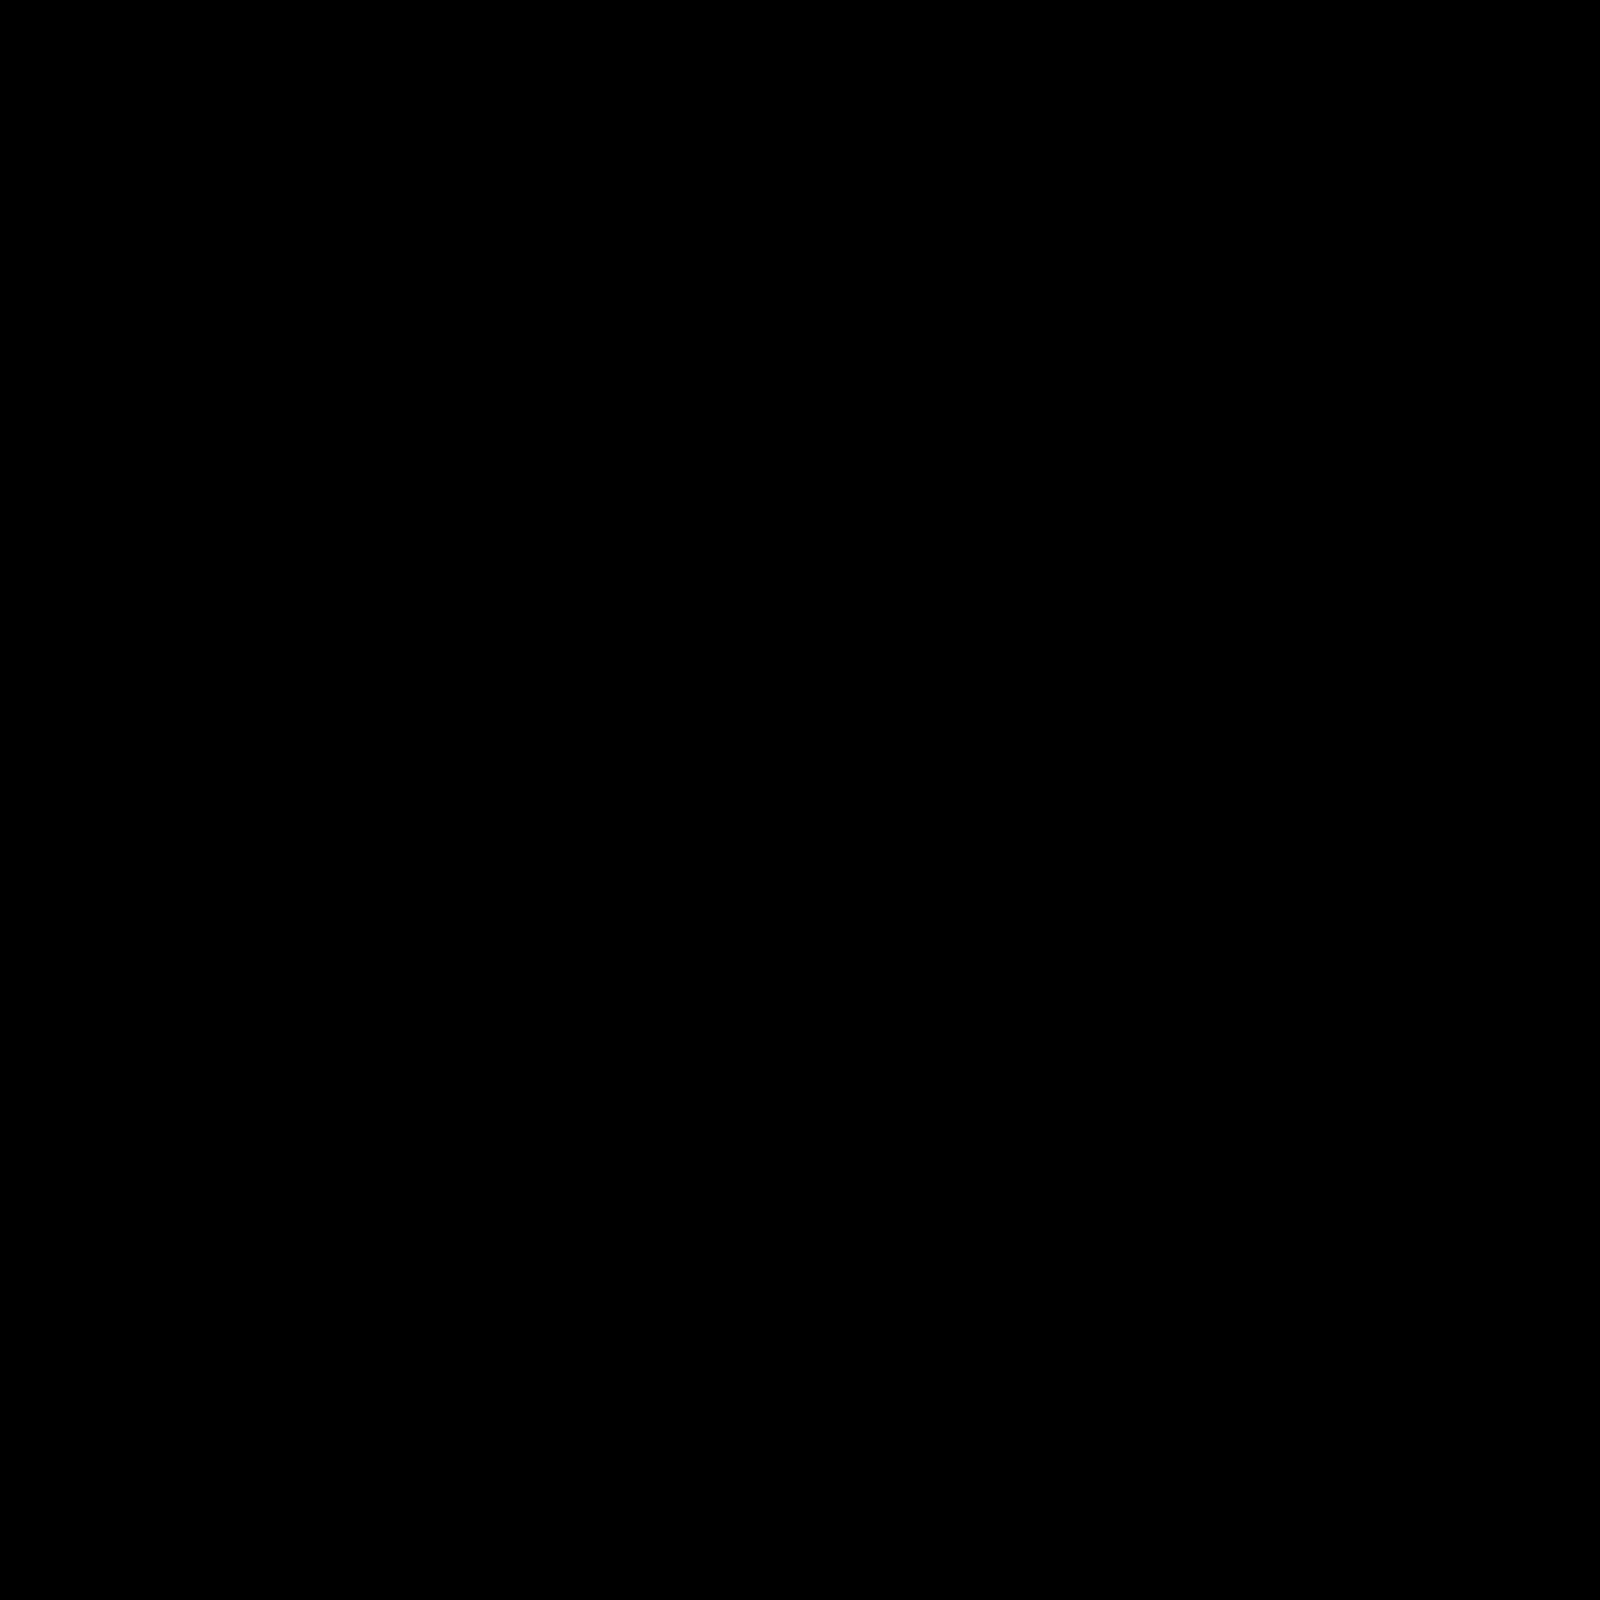 svg freeuse stock Drawing lambo. Lamborghini logo pinterest